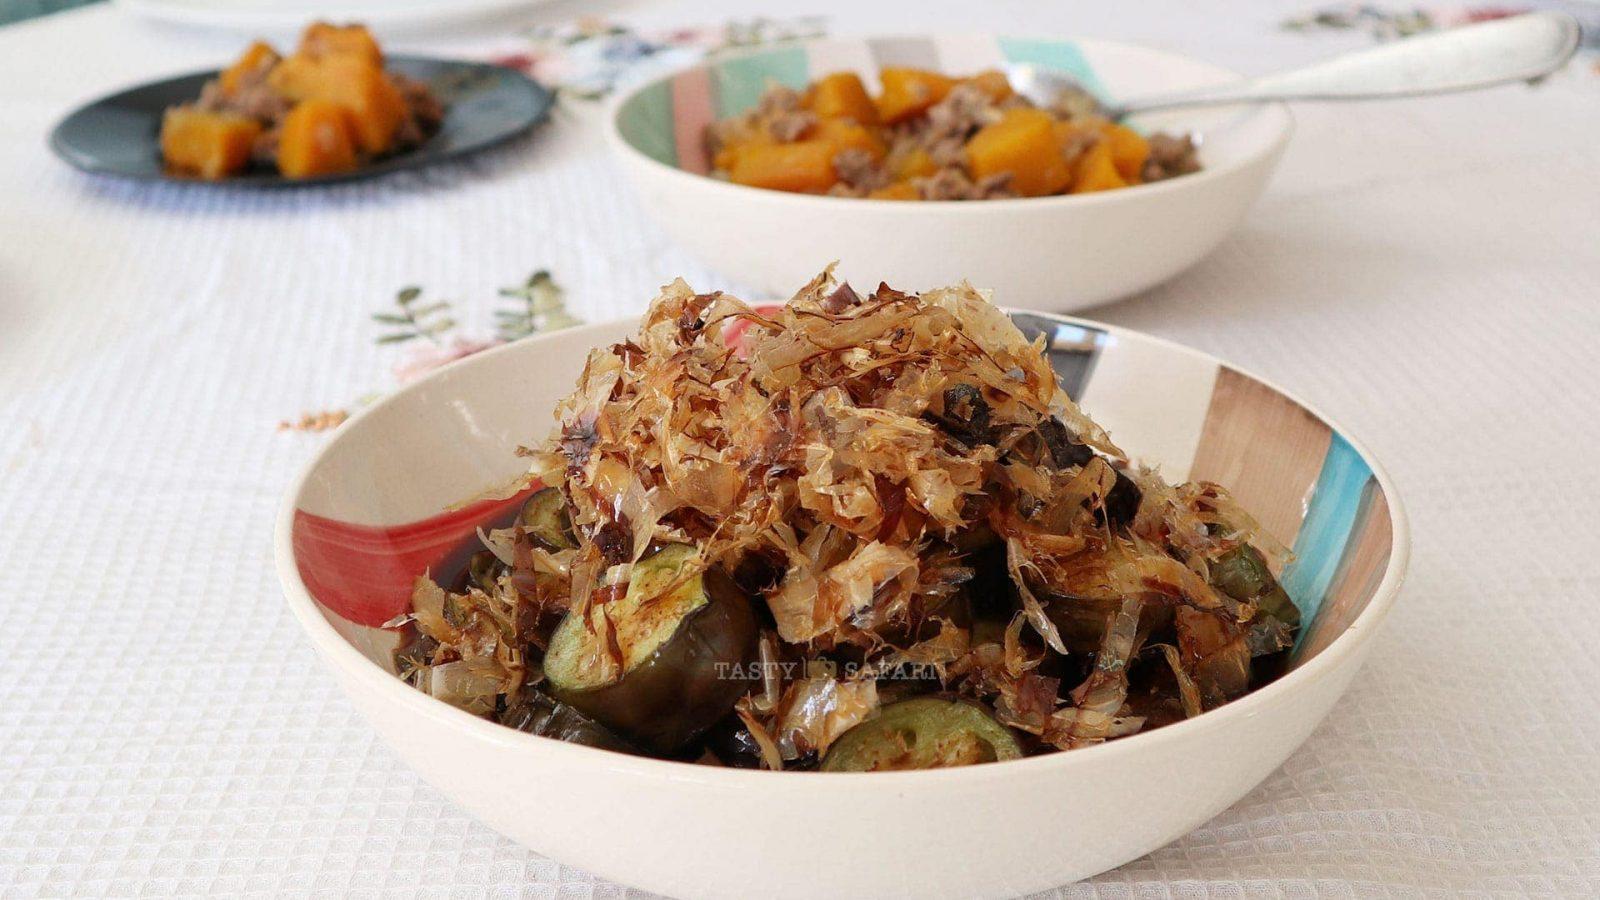 Japanese Fried Eggplants and Crispy Bonito Flakes with Dashi Sauce